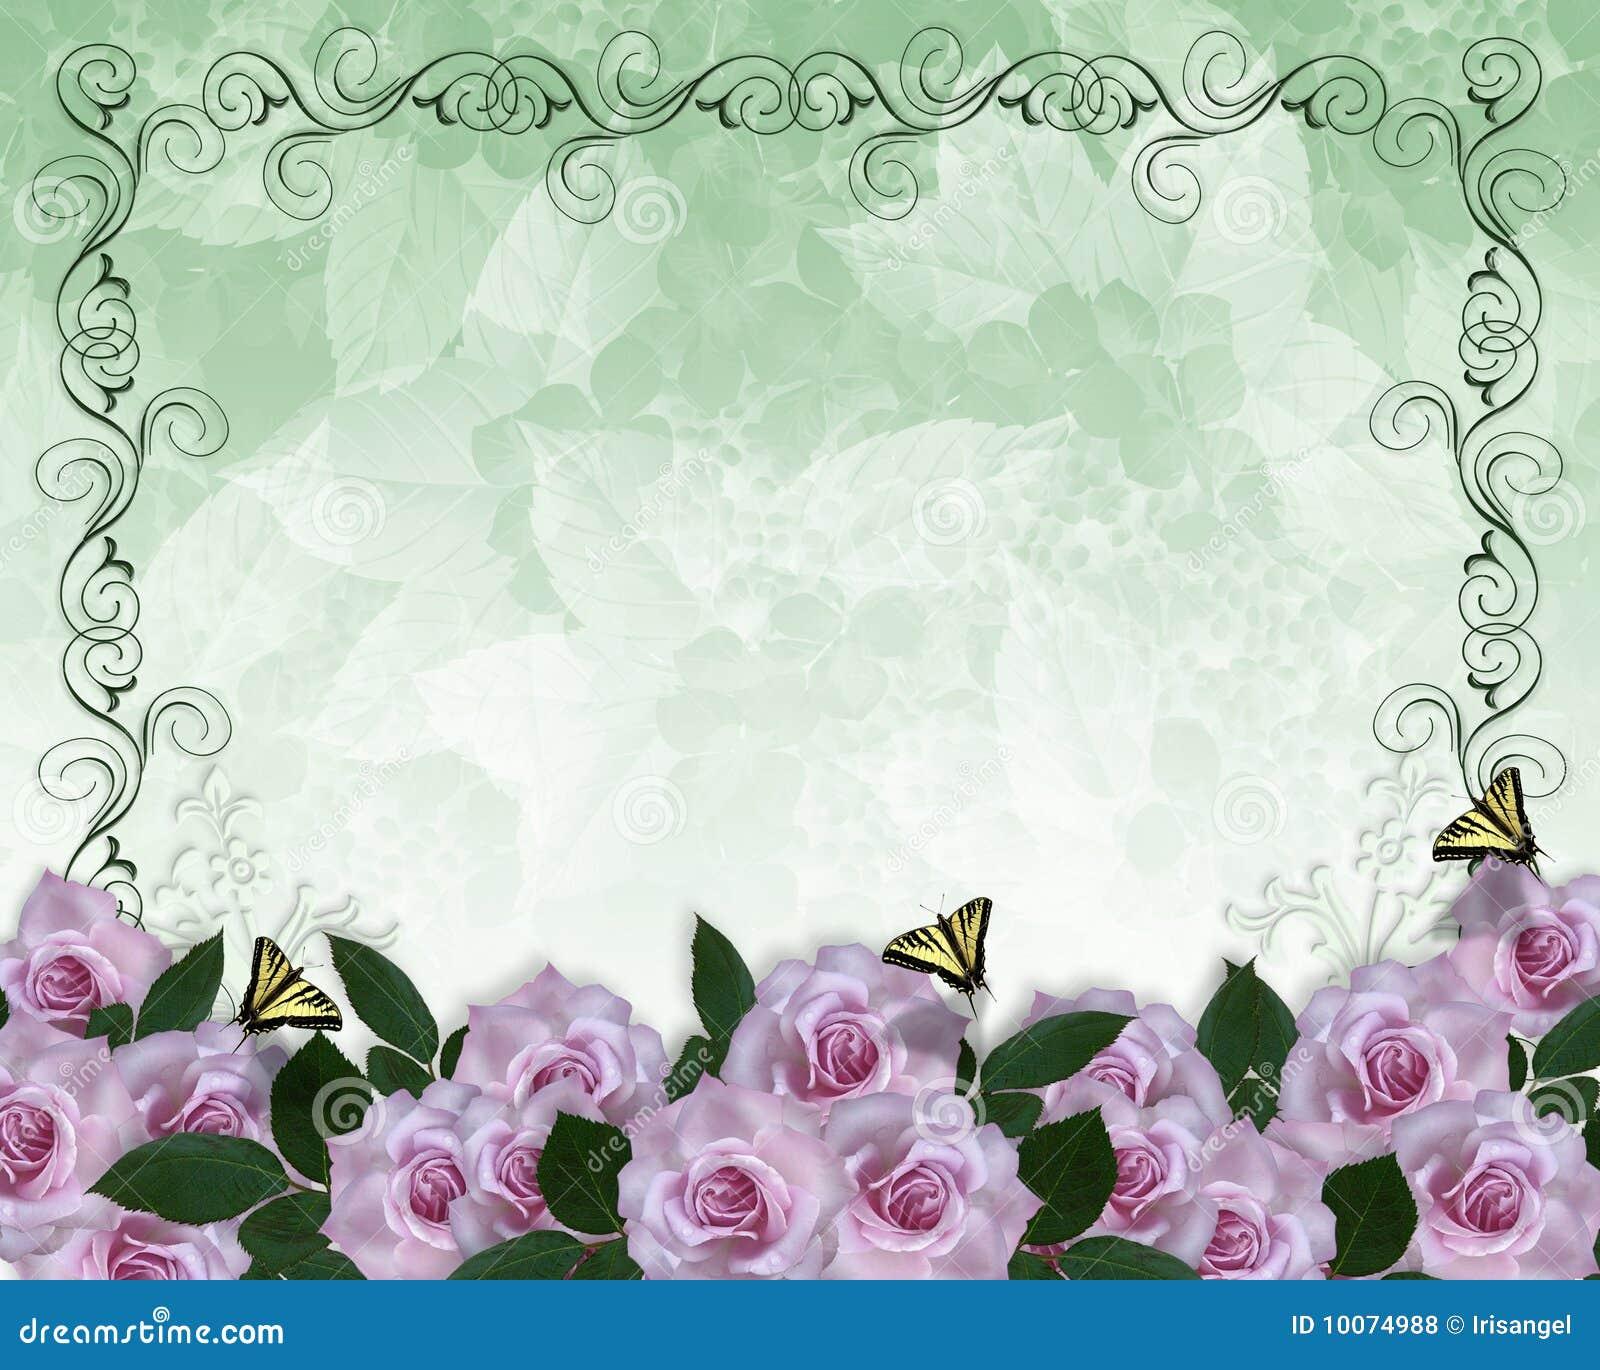 Wedding Invitation Floral Border Lavender Roses Stock Illustration